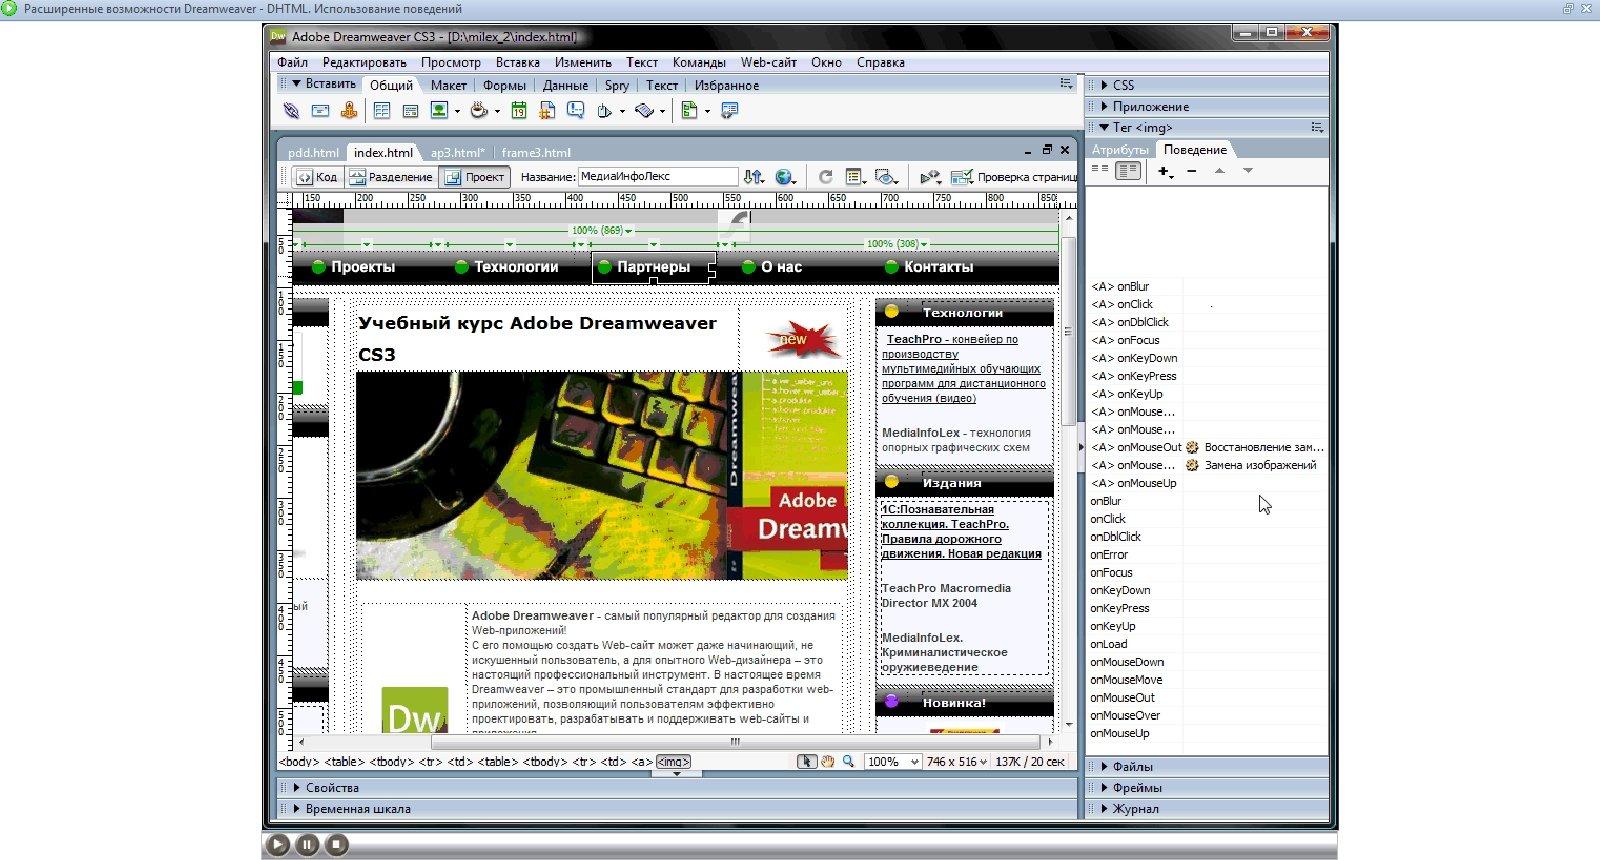 Adobe Dreamweaver CS3. (Базовый / Продвинутый) Обучающий курс